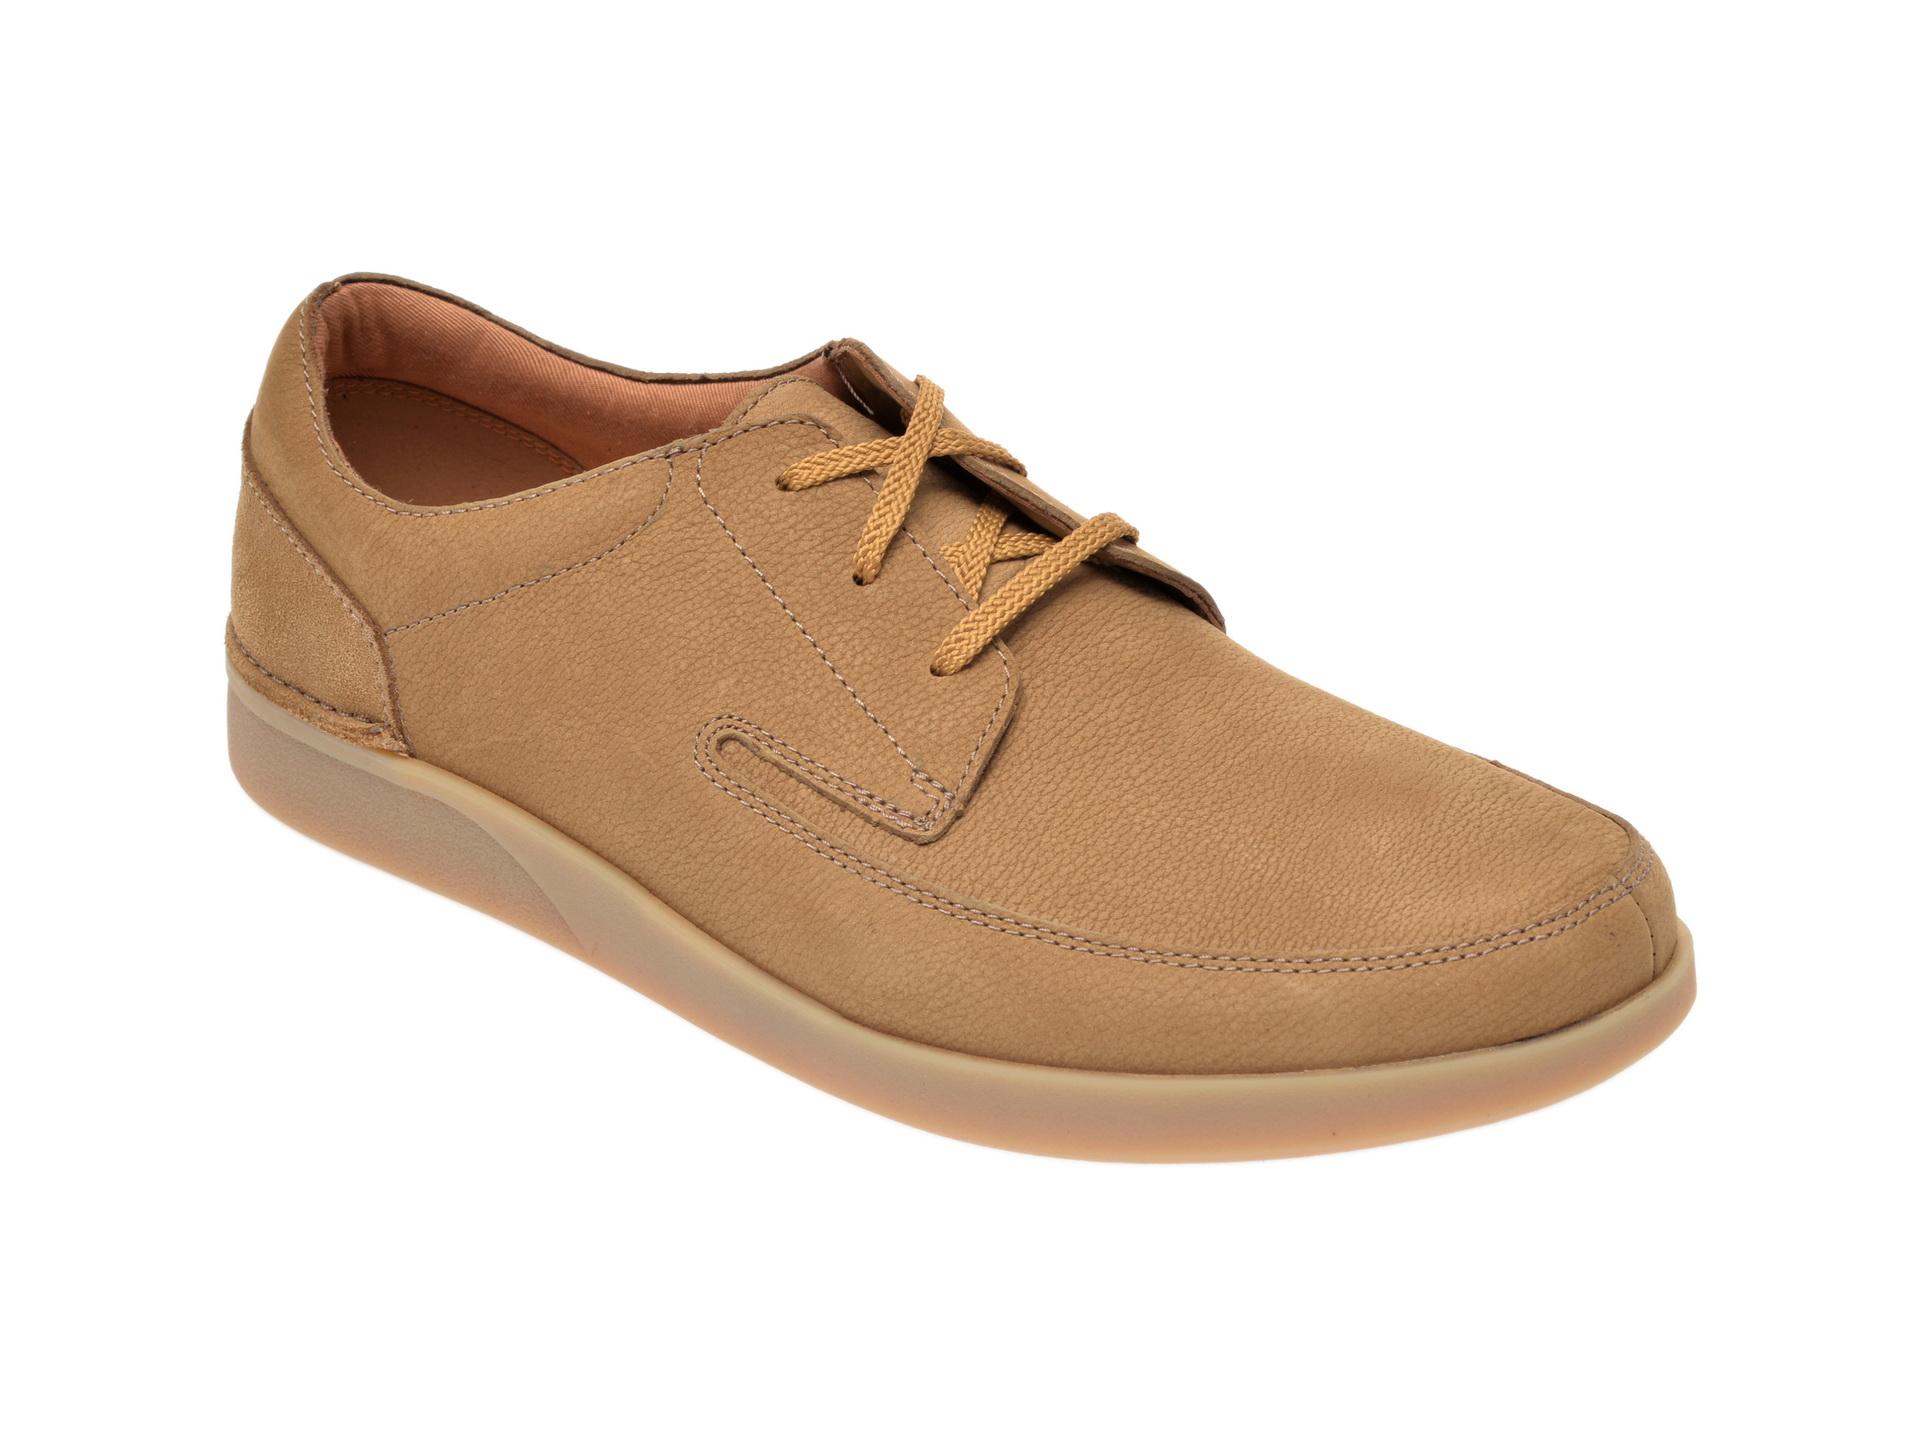 Pantofi CLARKS maro, Oakland Craft, din nabuc